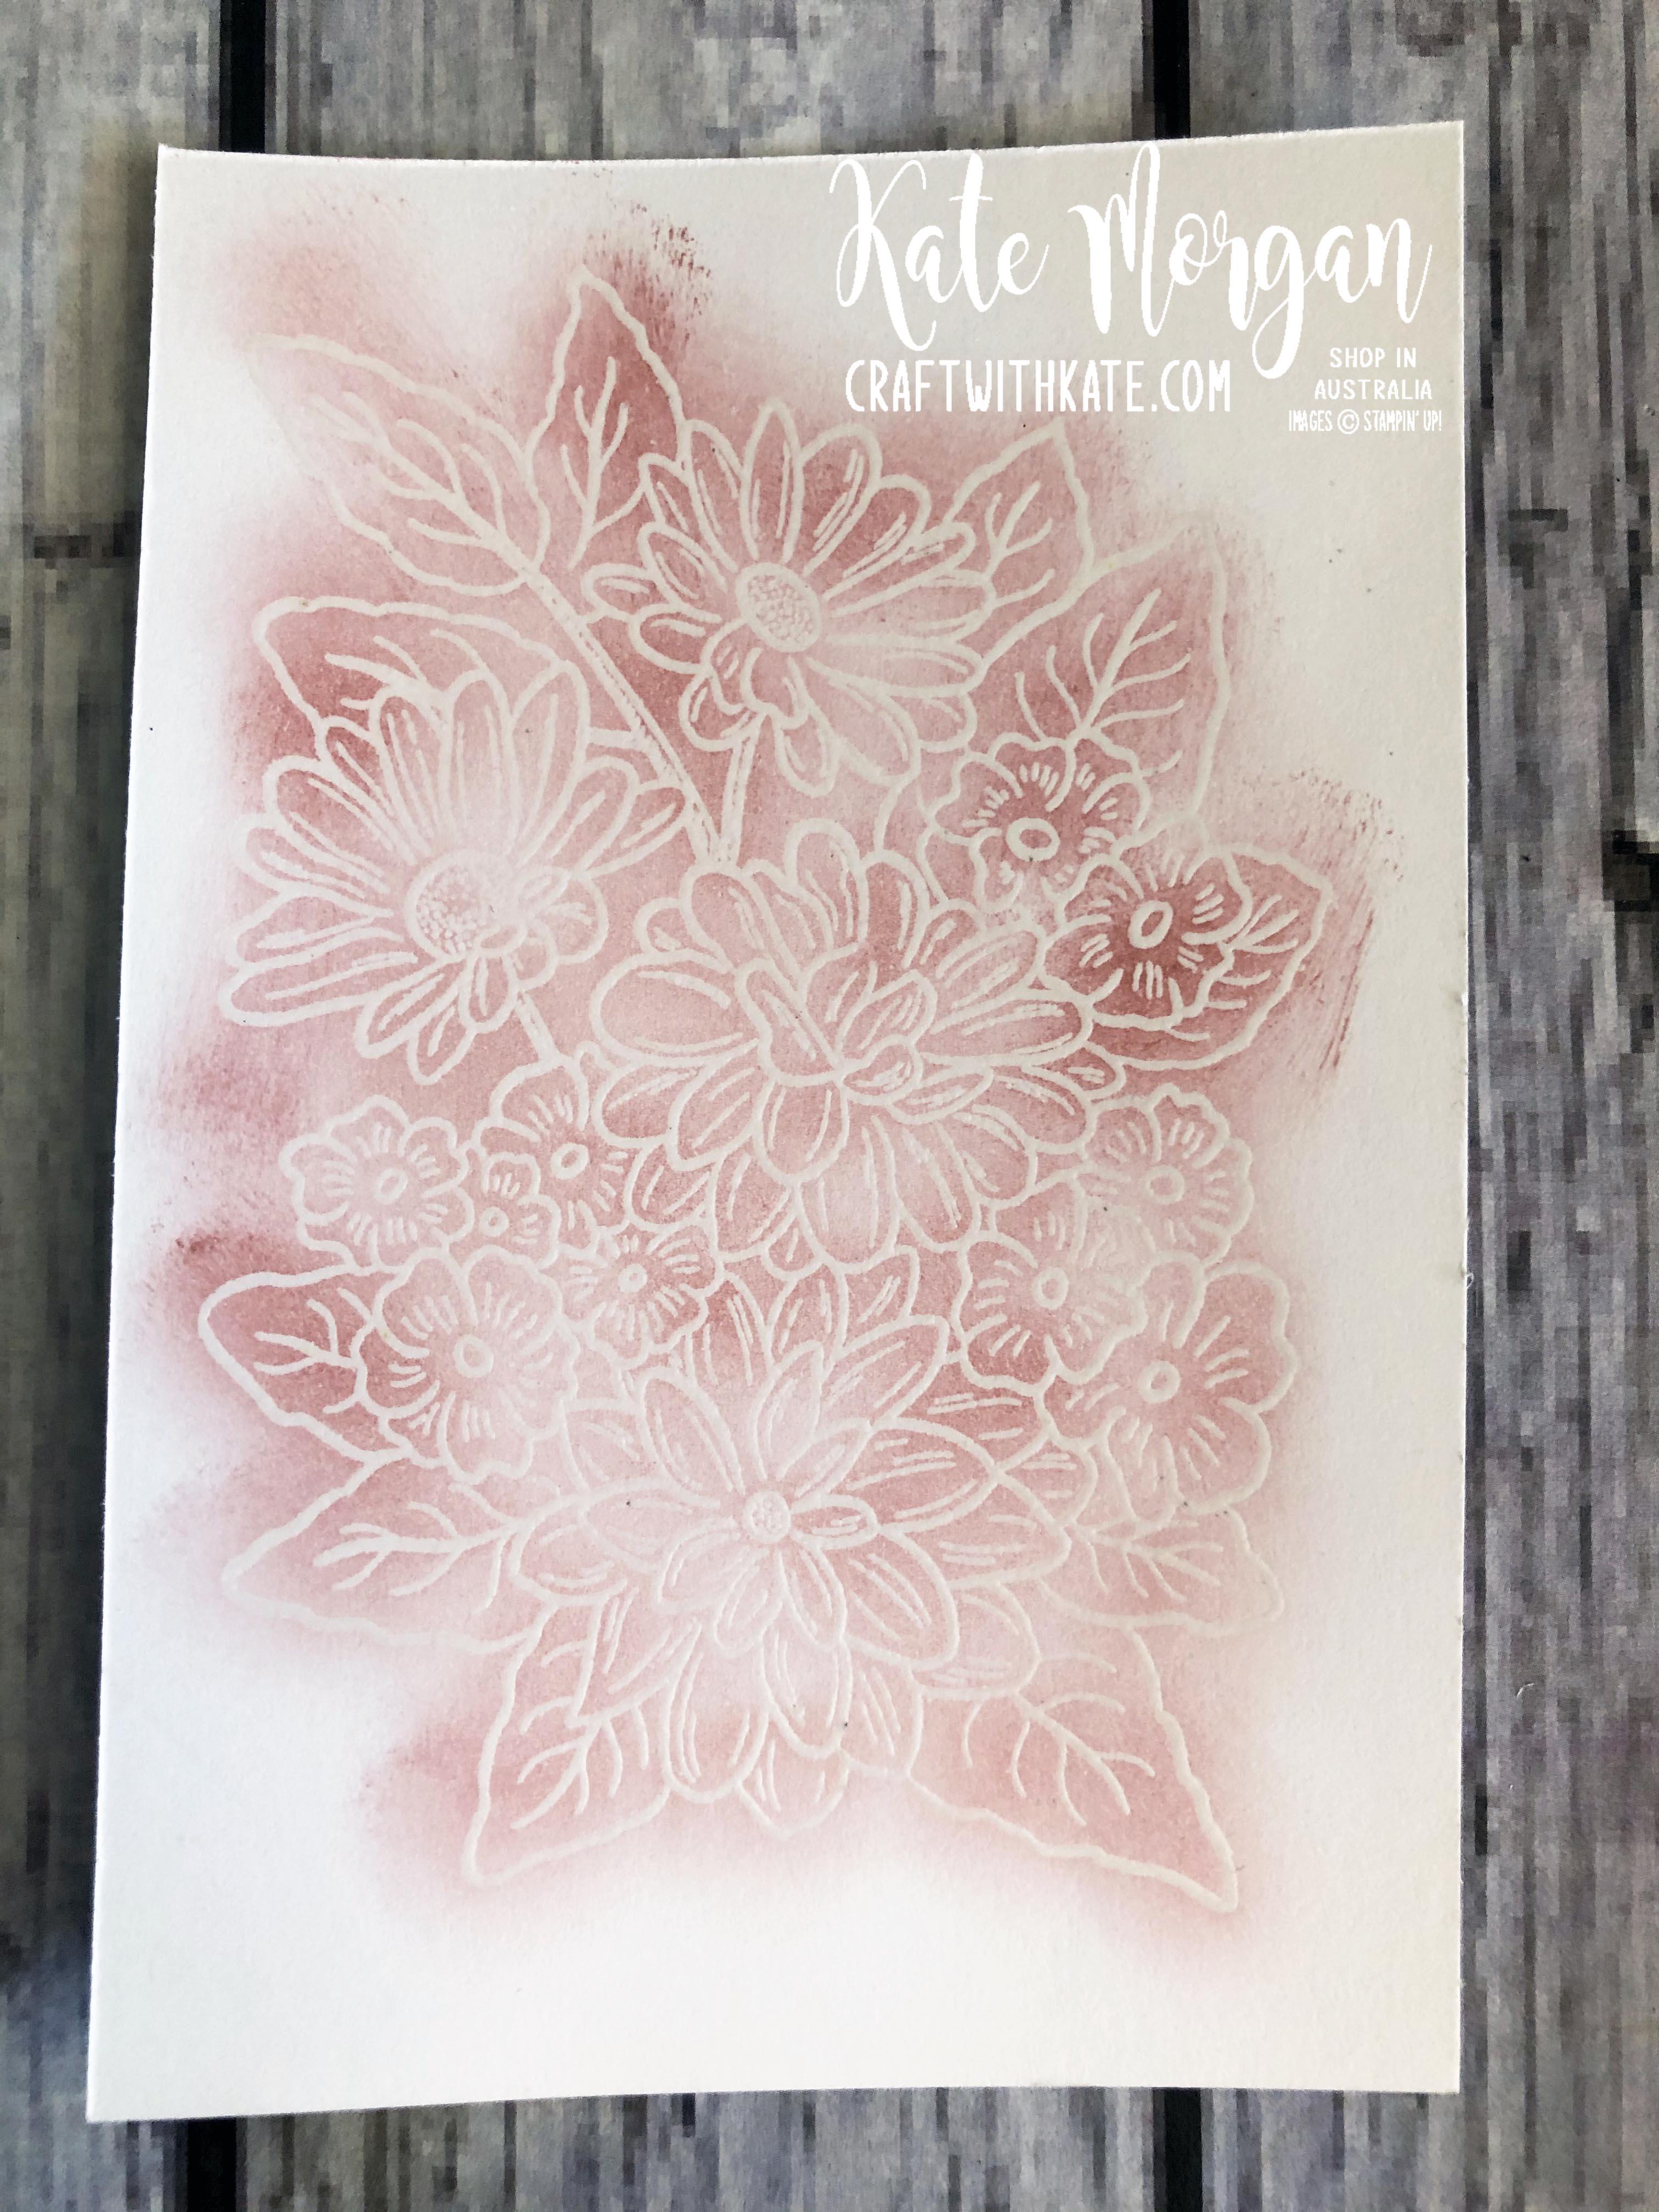 Monochrome Ornate Style Feminine card Stampin Up 2020 by Kate Morgan, Australia process